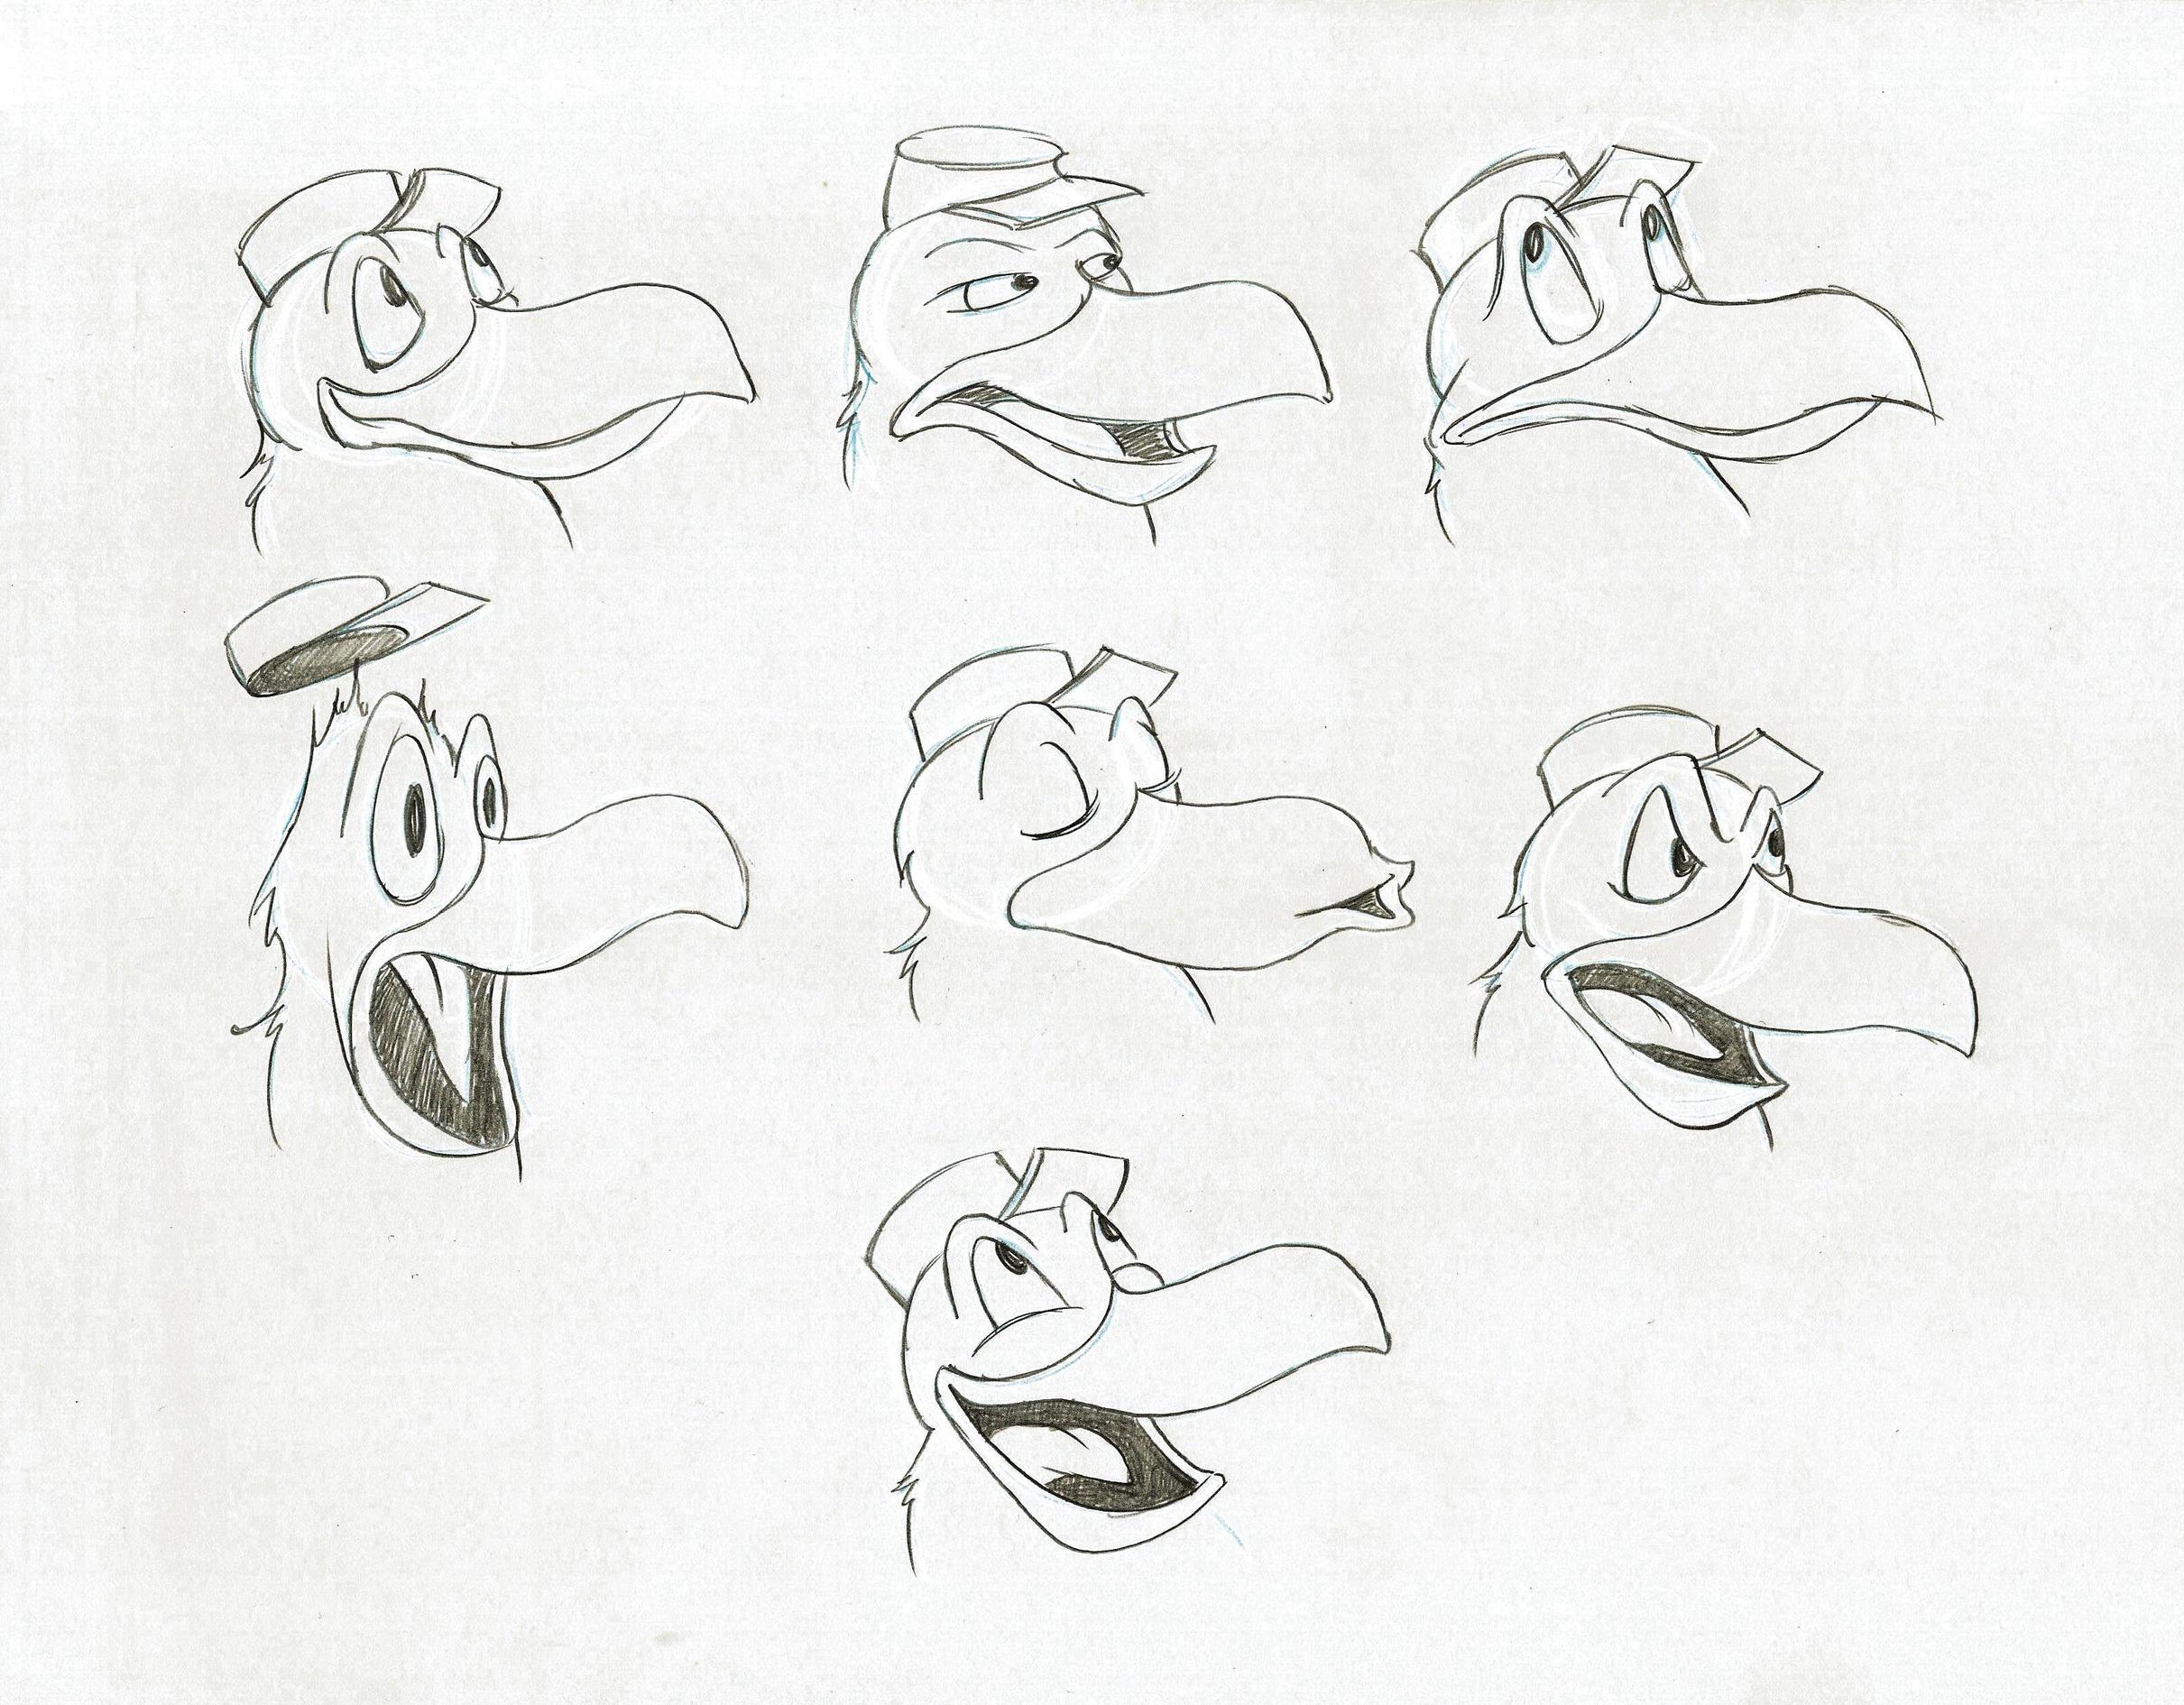 Raven expression sheet by Tom Bertino.